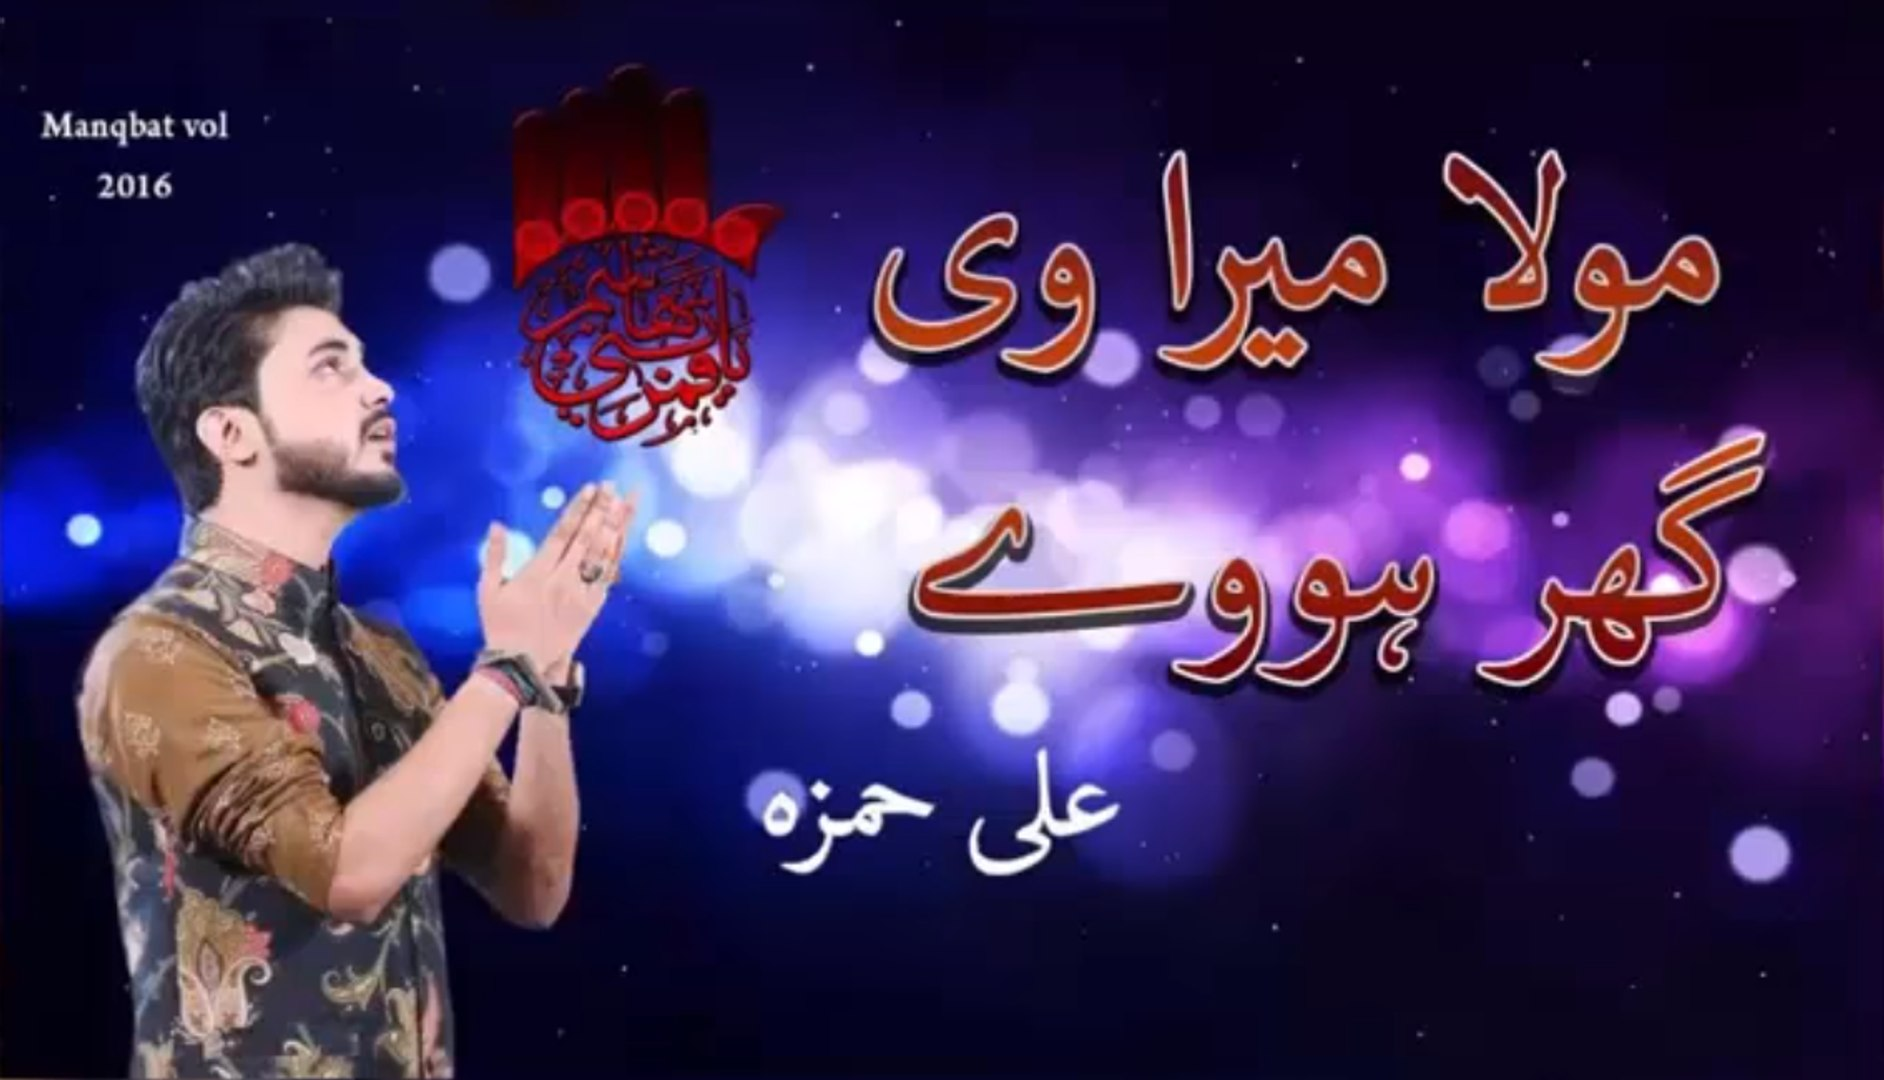 Moula Mera Ve Ghar Howay | Ali Hamza | مولا میرا وی گھر ہوے | Punjabi  Qasida Mola Mera Ve Ghar Remix